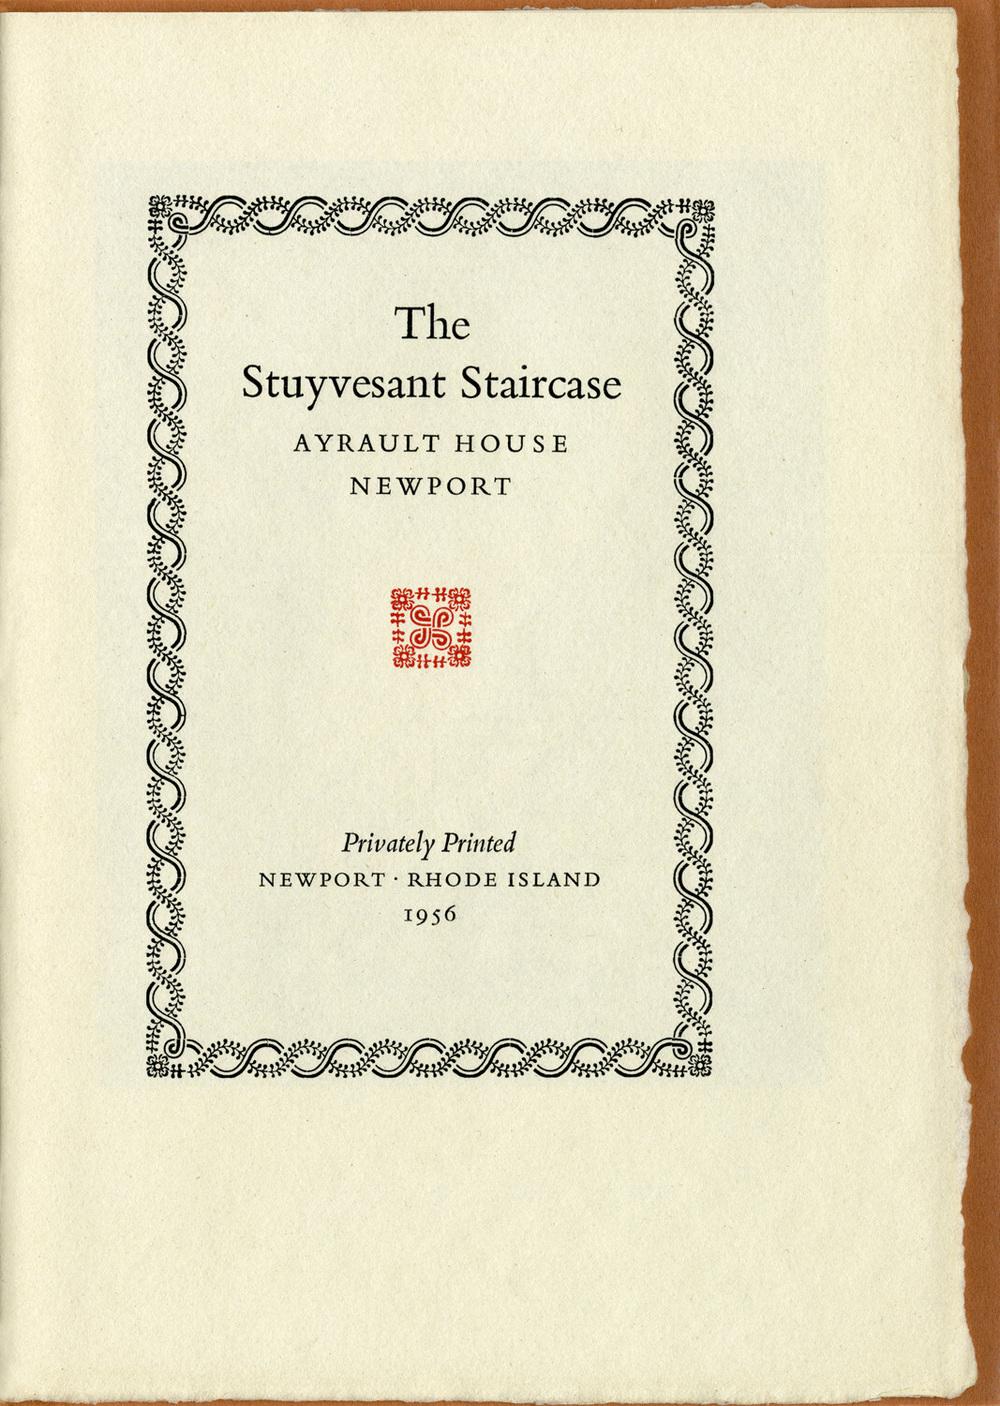 The Stuyvesant Staircase_pg.2.jpg